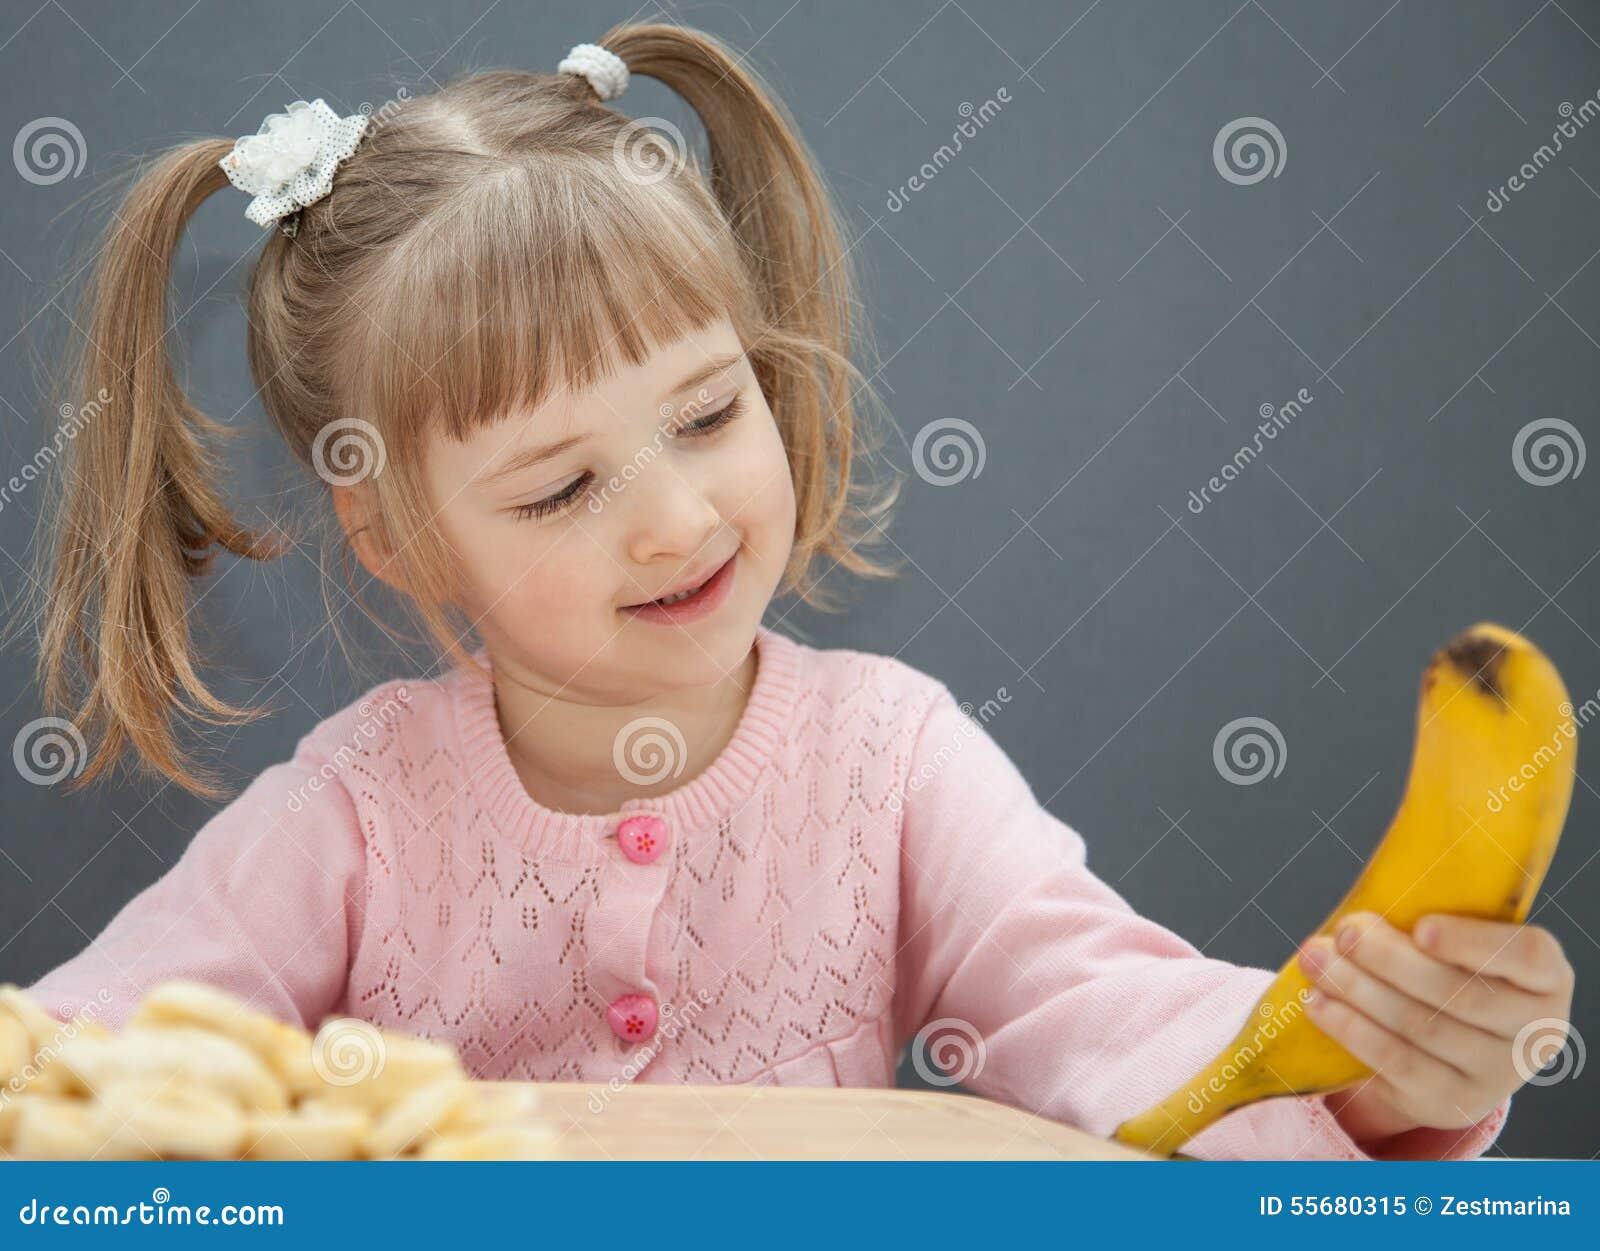 Charming little girl holding a ripe banana